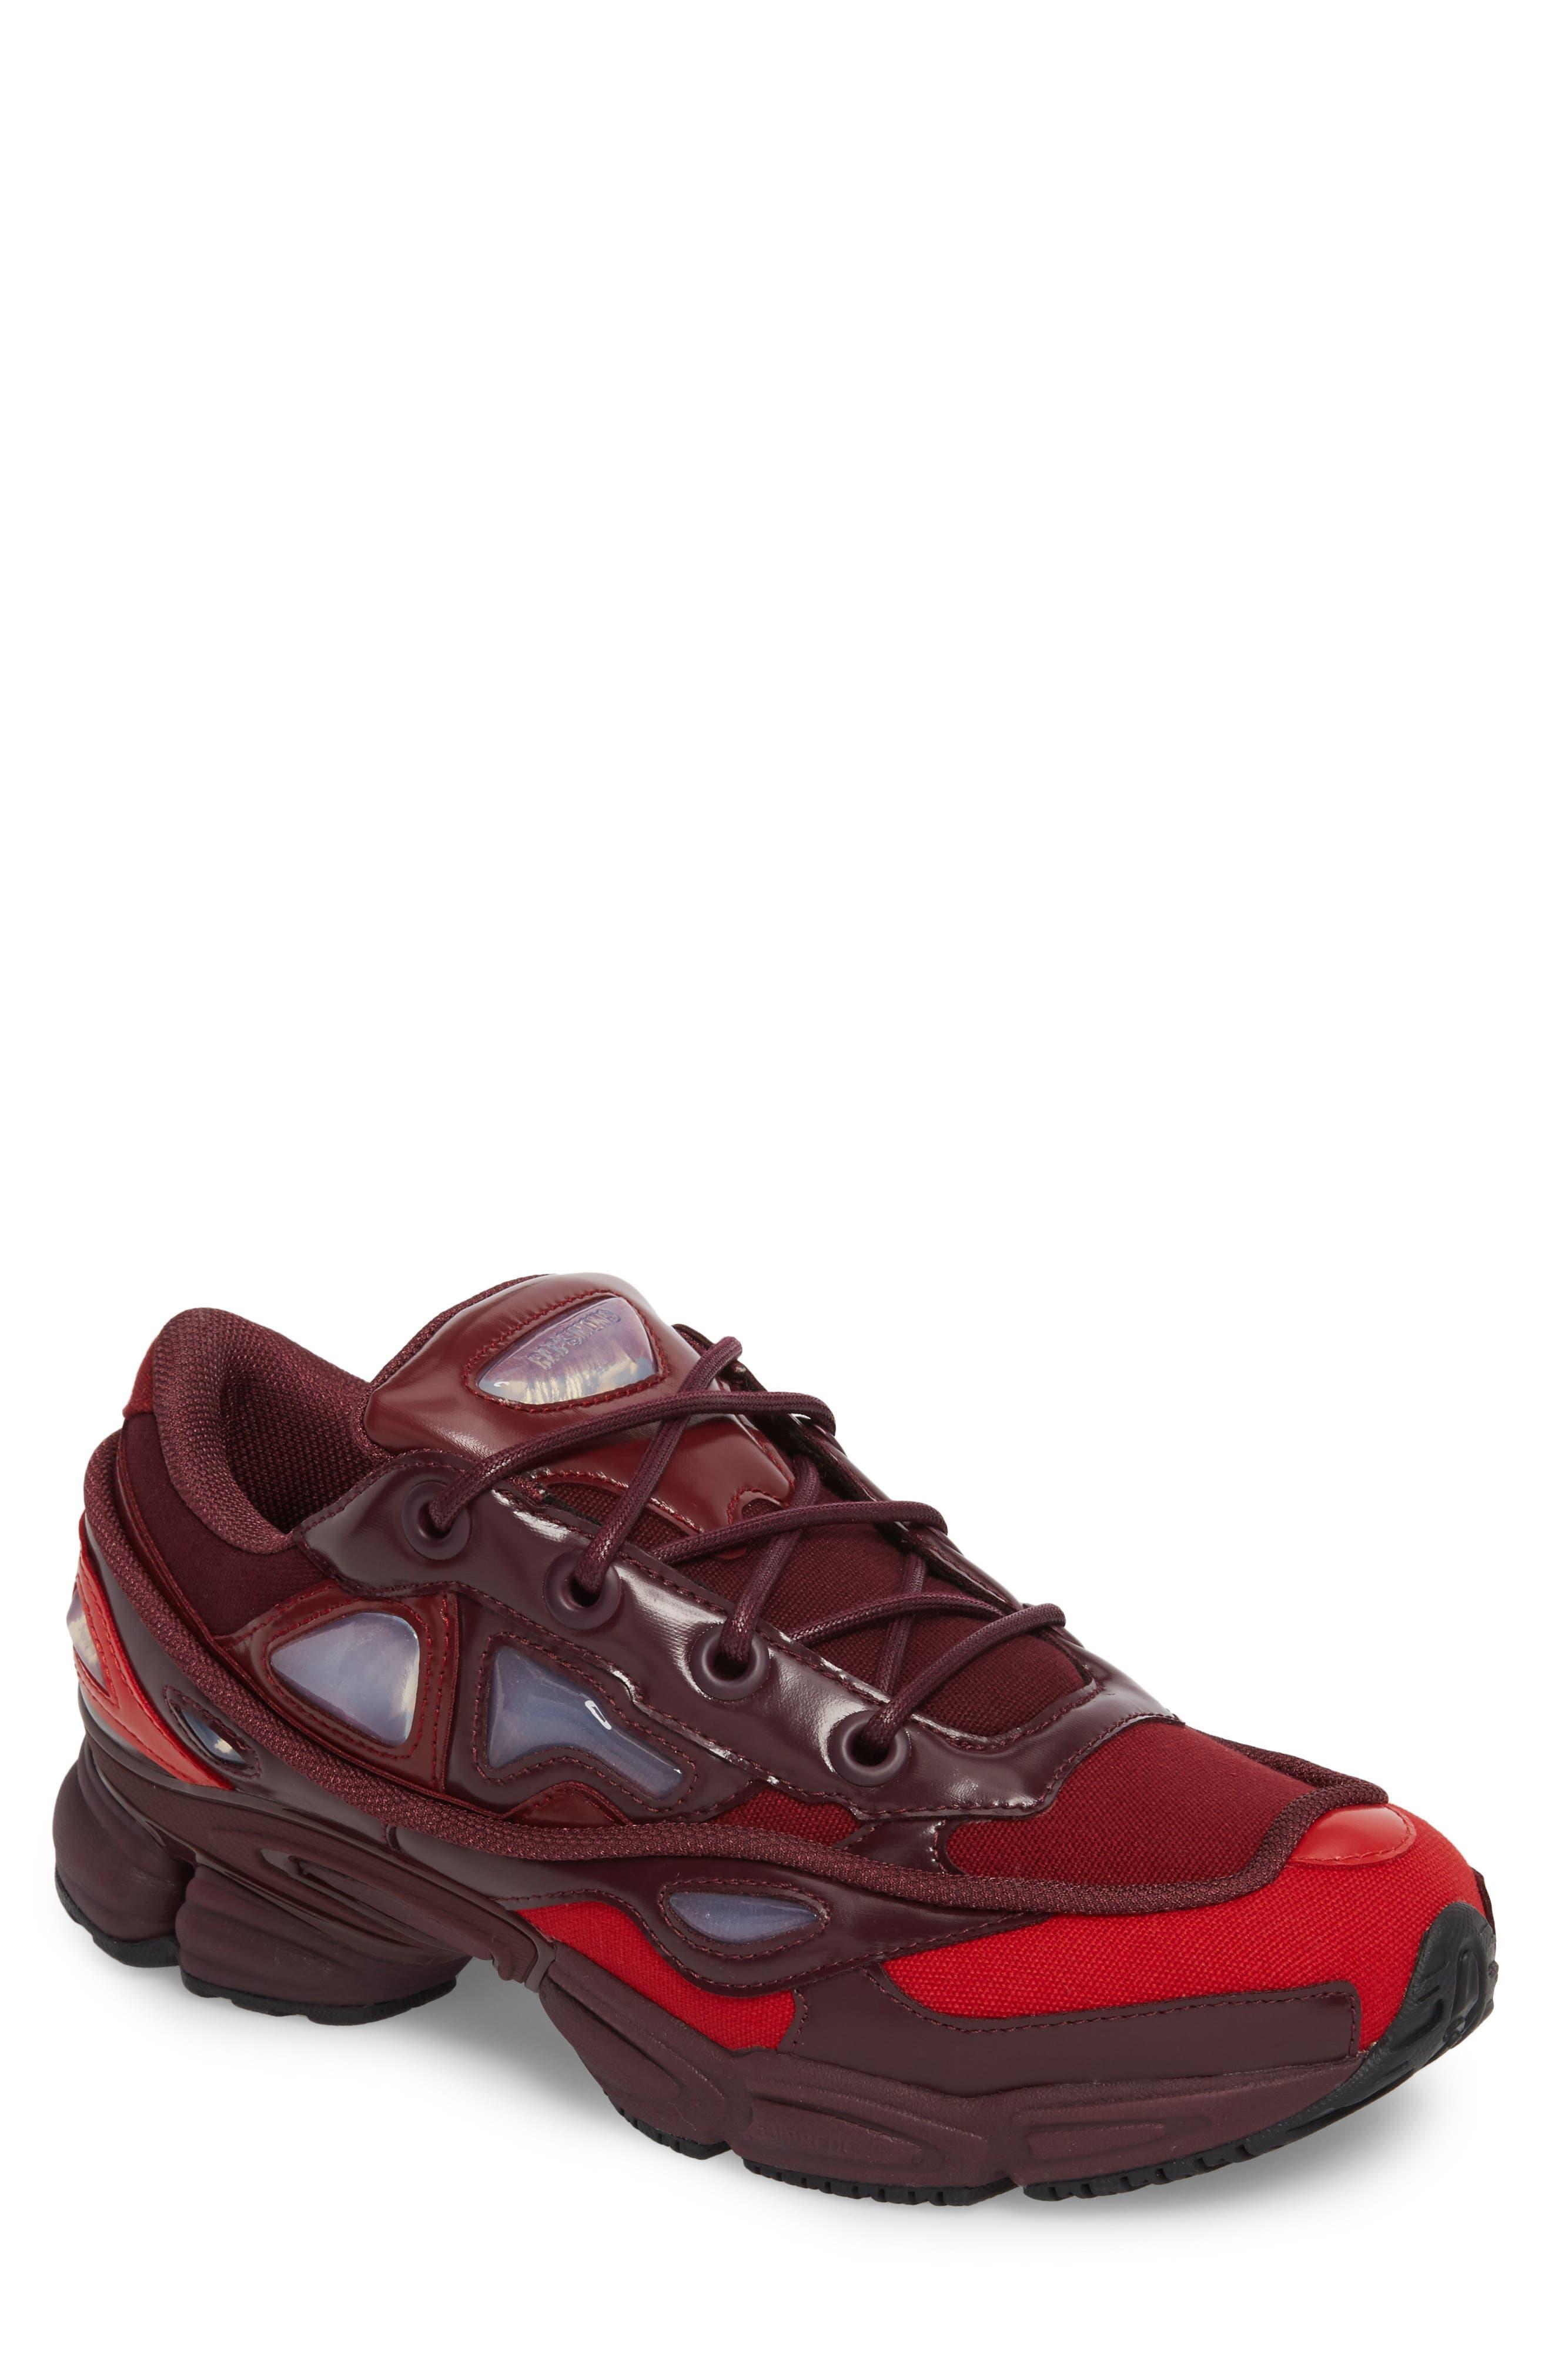 adidas by Raf Simons Ozweego III Sneaker,                         Main,                         color, Burgundy/ Maroon/ Scarlet